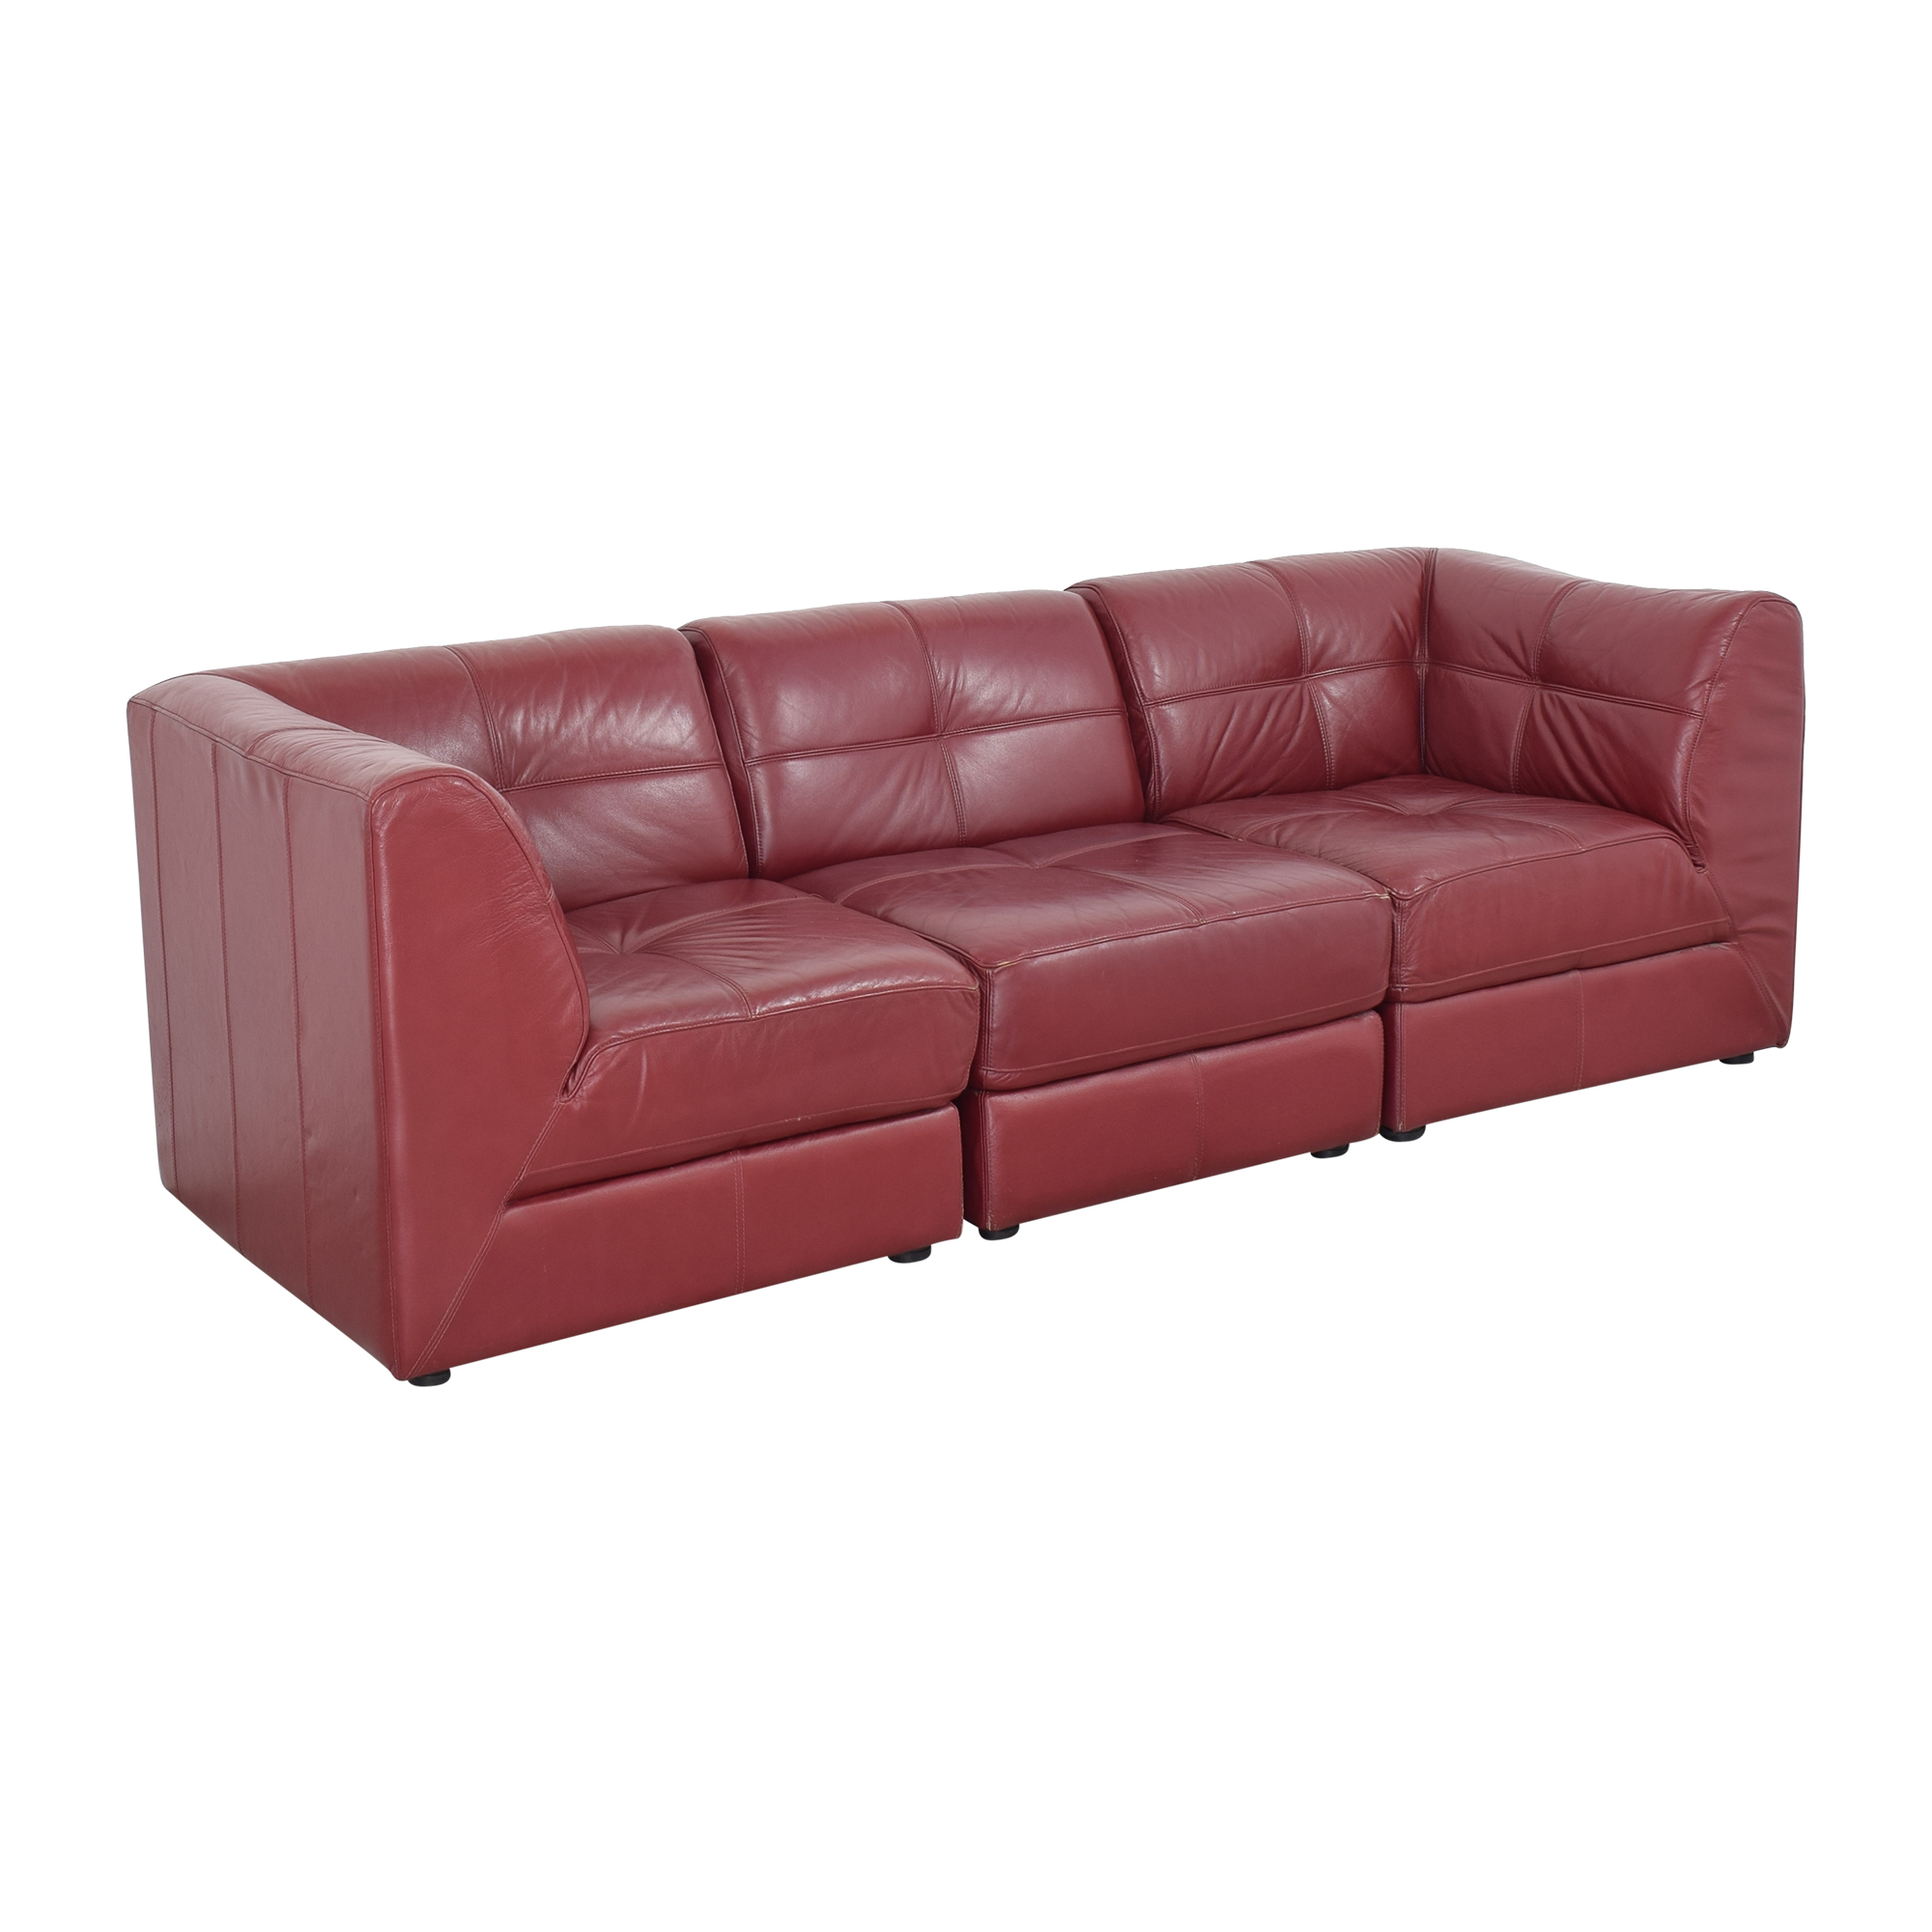 Raymour & Flanigan Raymour & Flanigan Modular Sofa Sectionals